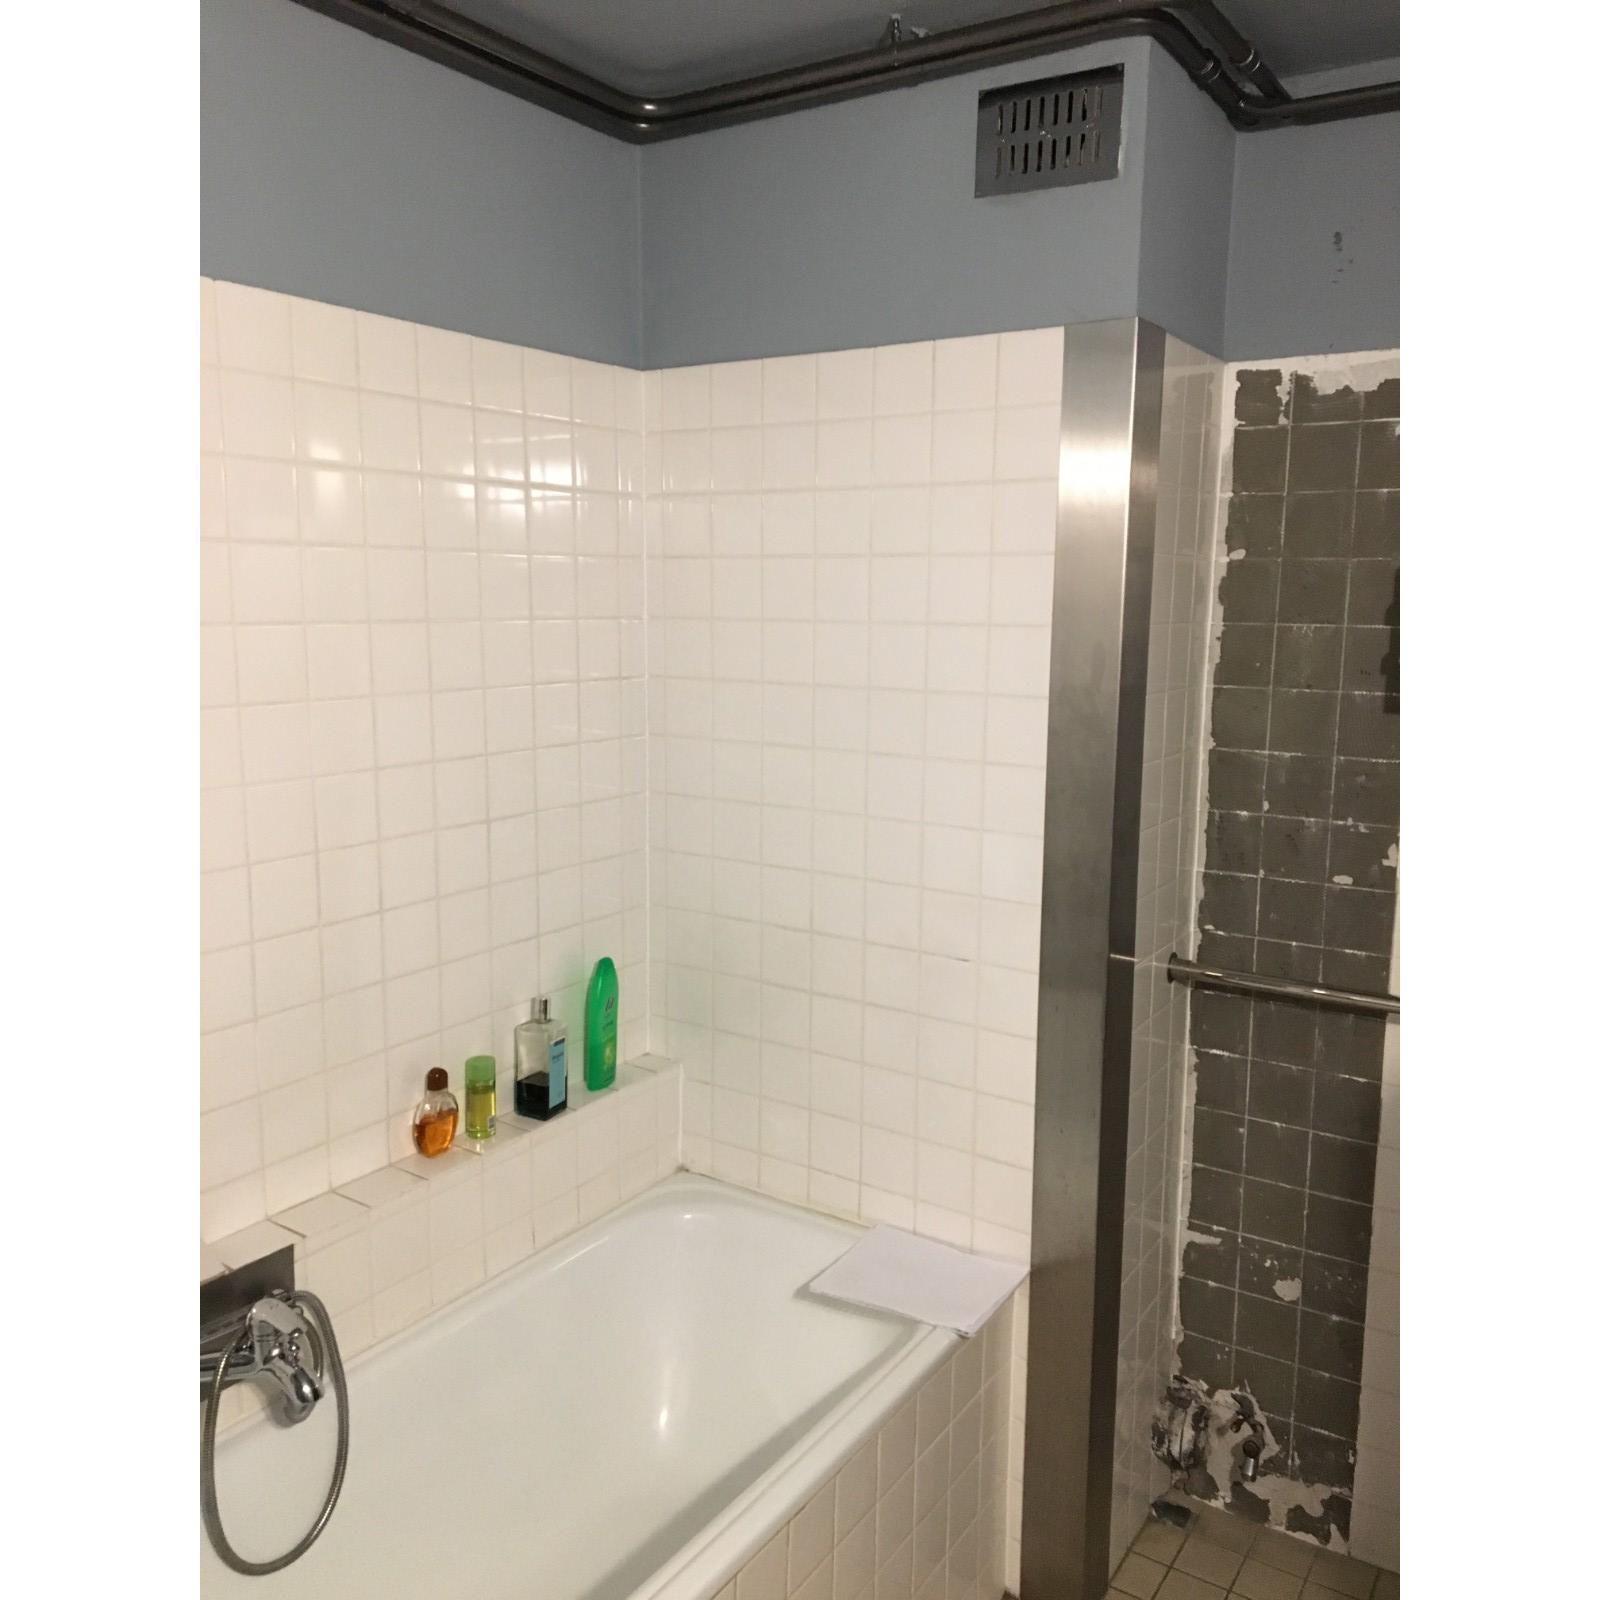 Looox, La Fabricca, Porcelanosa, Easydrain, S-line, Vitra, douche wc, badkamer verbouwing, renovatie, amsterdam, tuijps, beton cire, porcelanosa, la fabricca, verlaagd plafond, stucen, led spotjes